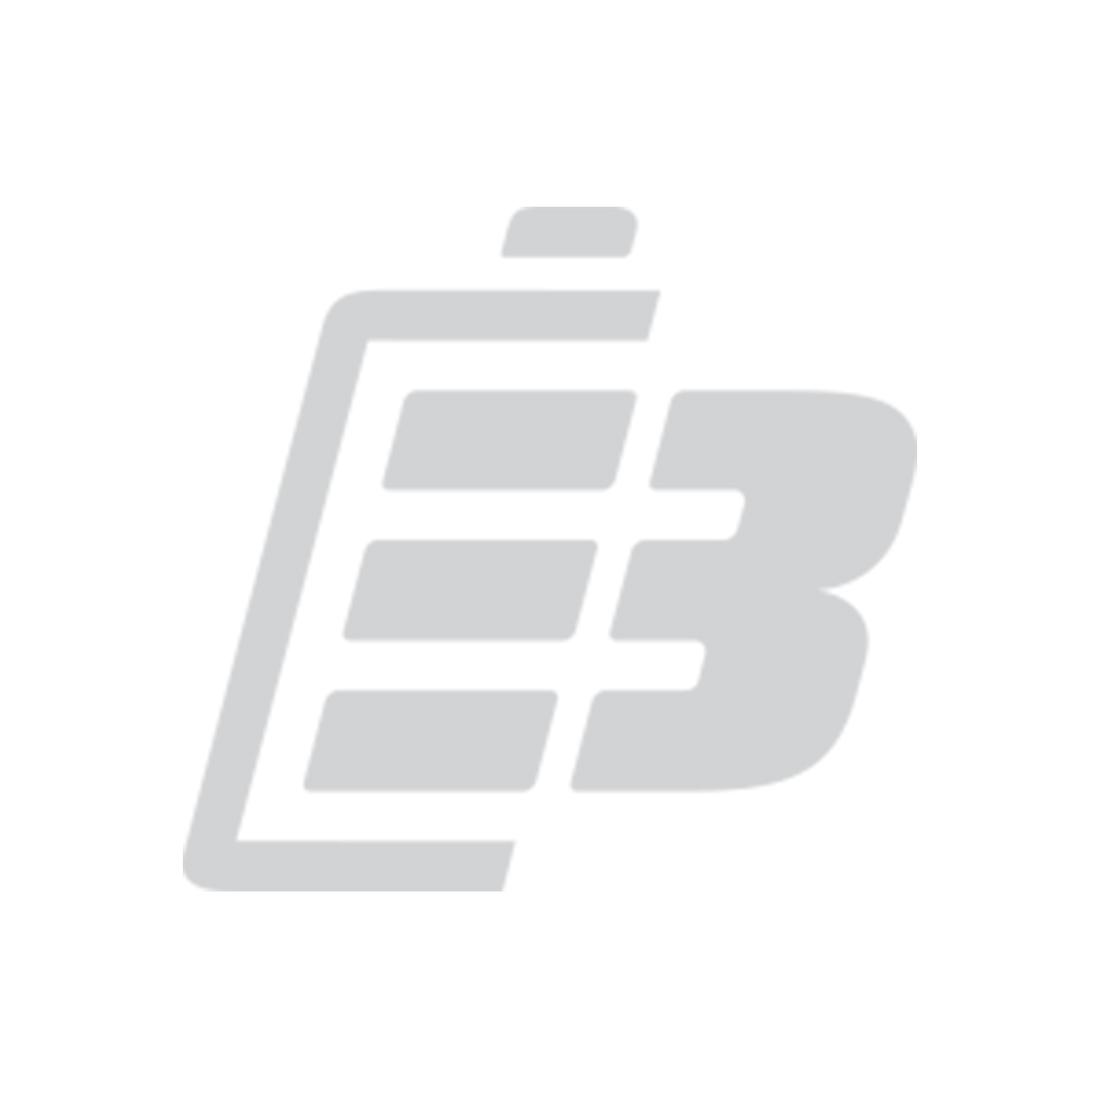 Laptop Adapter for Apple 16.5V 60W MagSafe_1